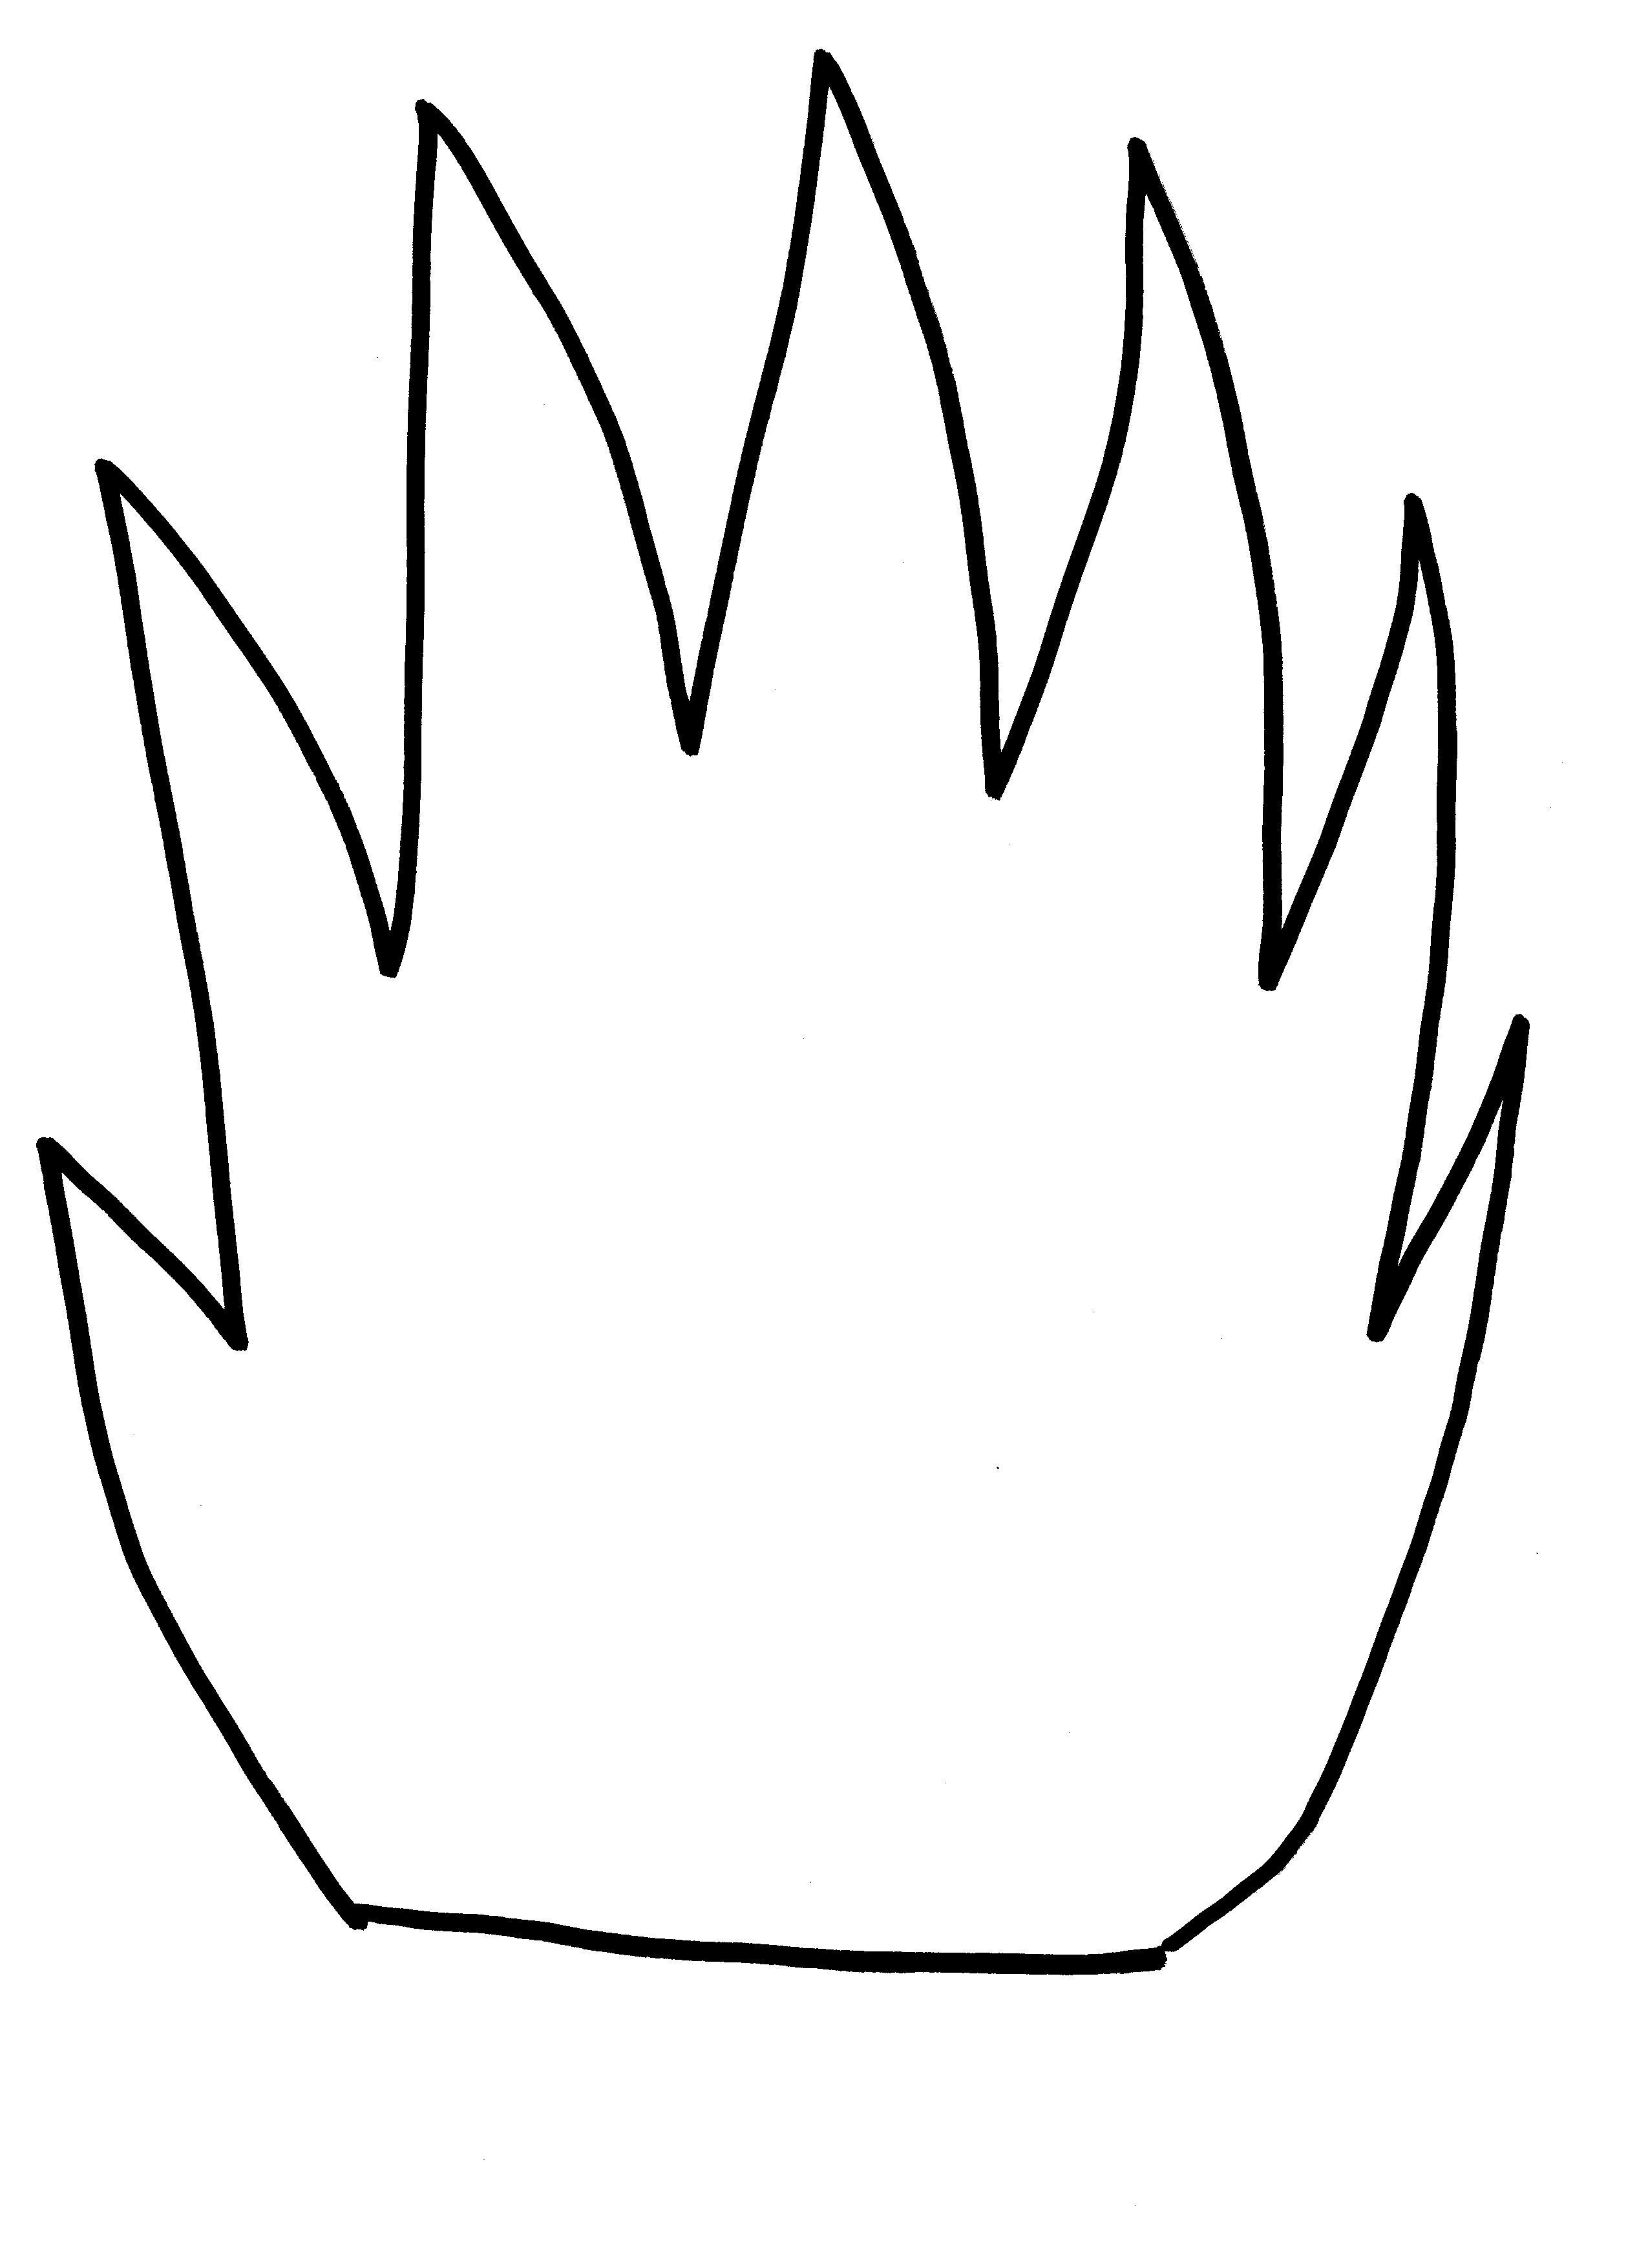 Flame Template Printout - Cliparts.co